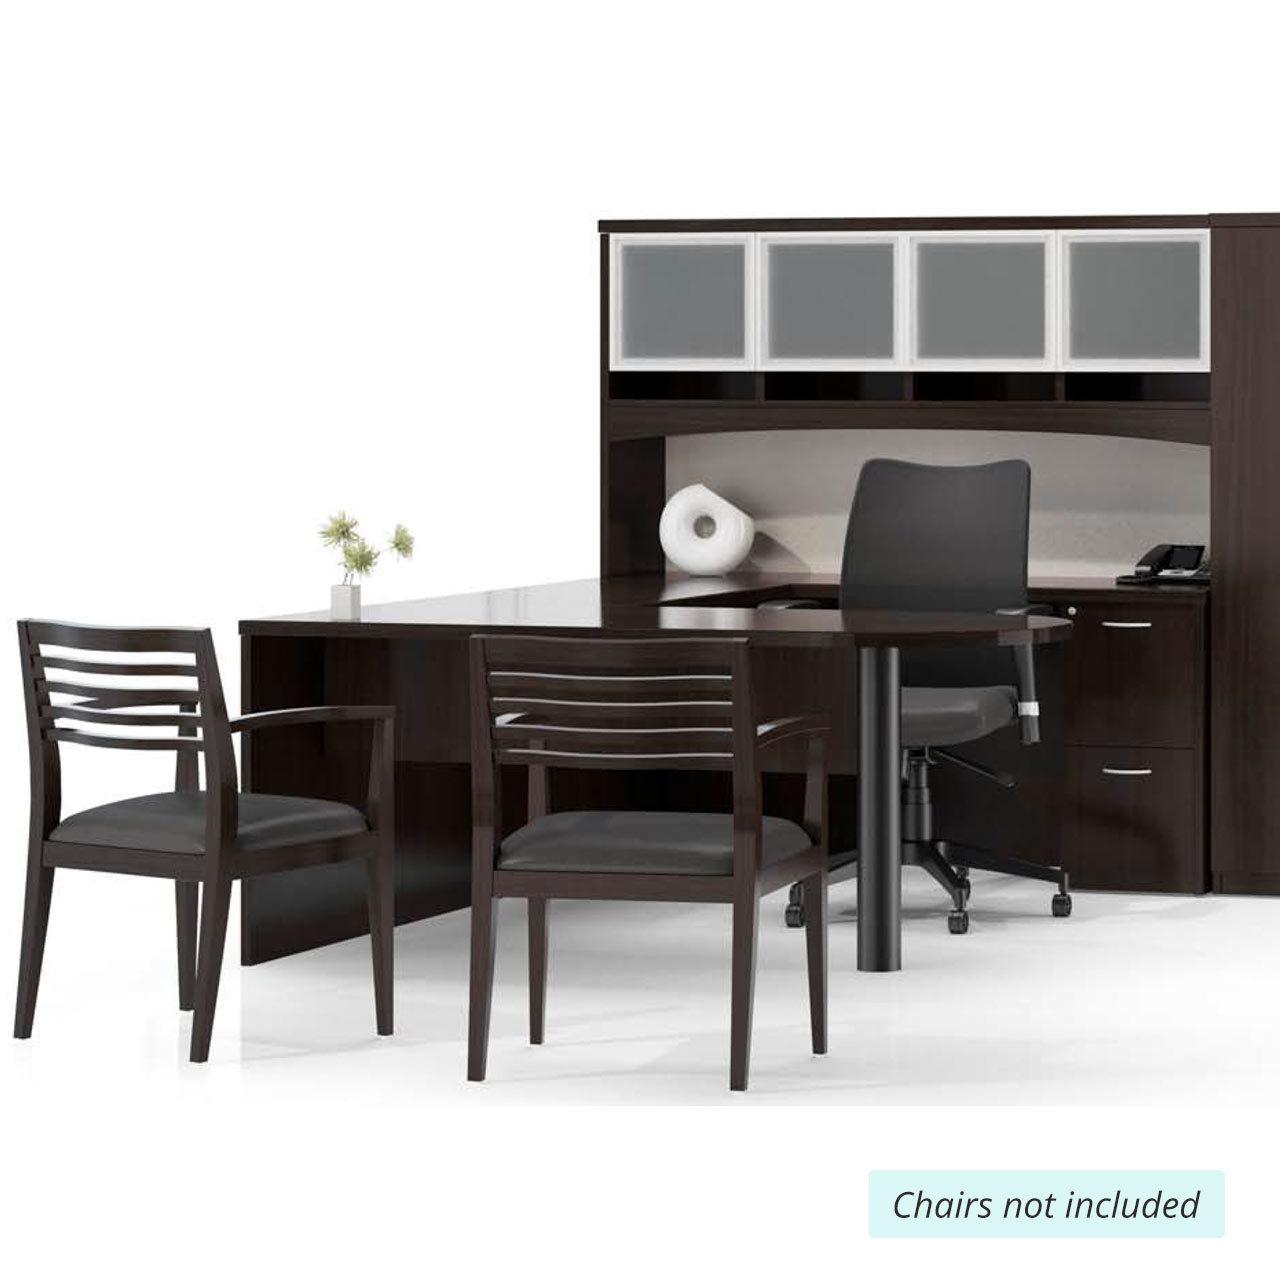 insignia office desk storage fastcubes office furniture. Black Bedroom Furniture Sets. Home Design Ideas